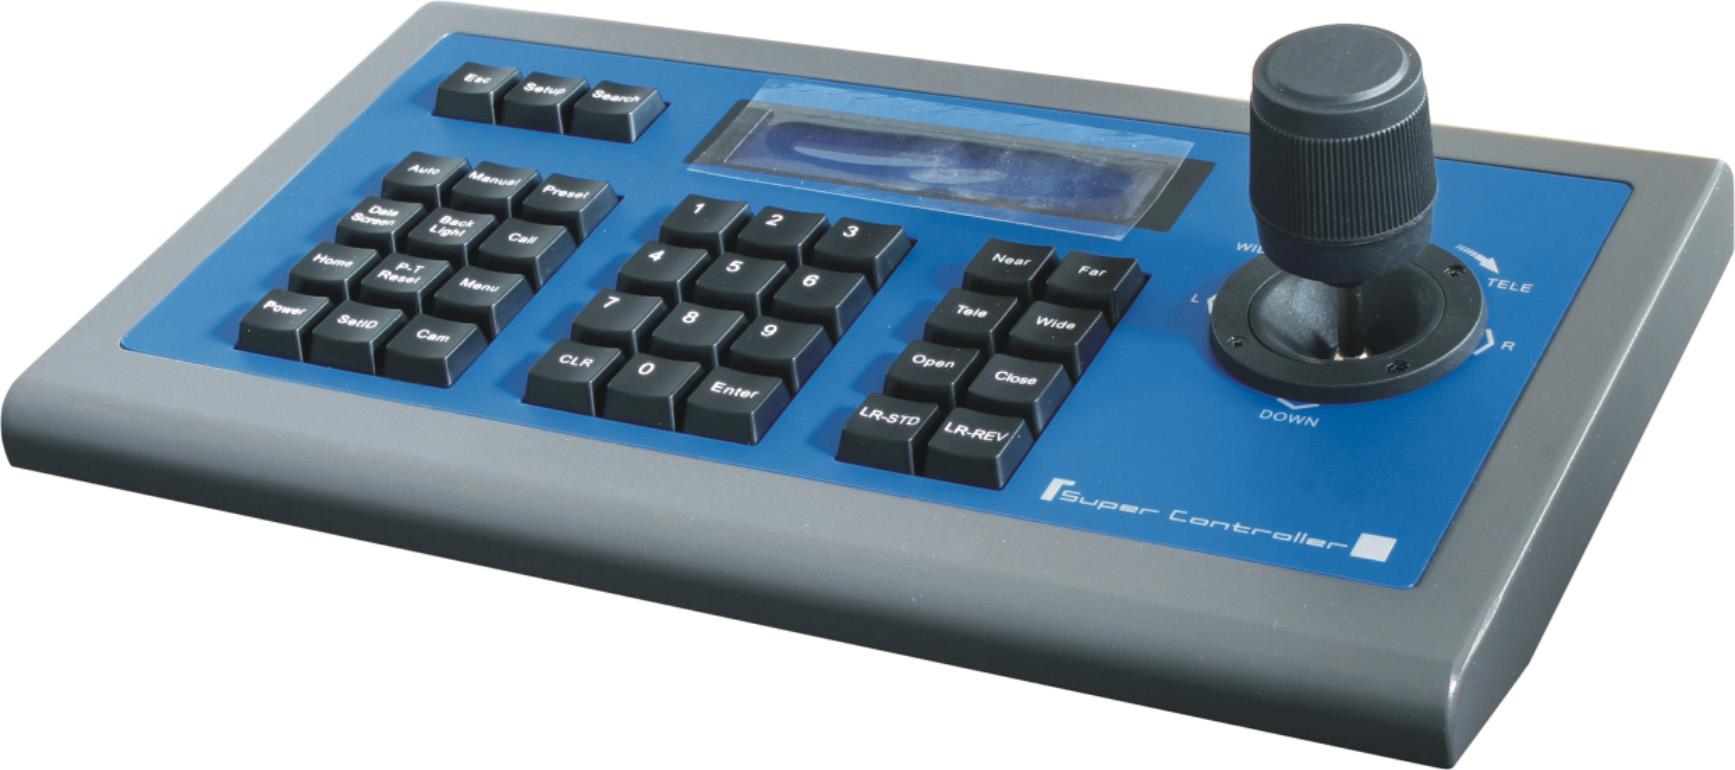 AVL-KC10 Video camera keyboard controller